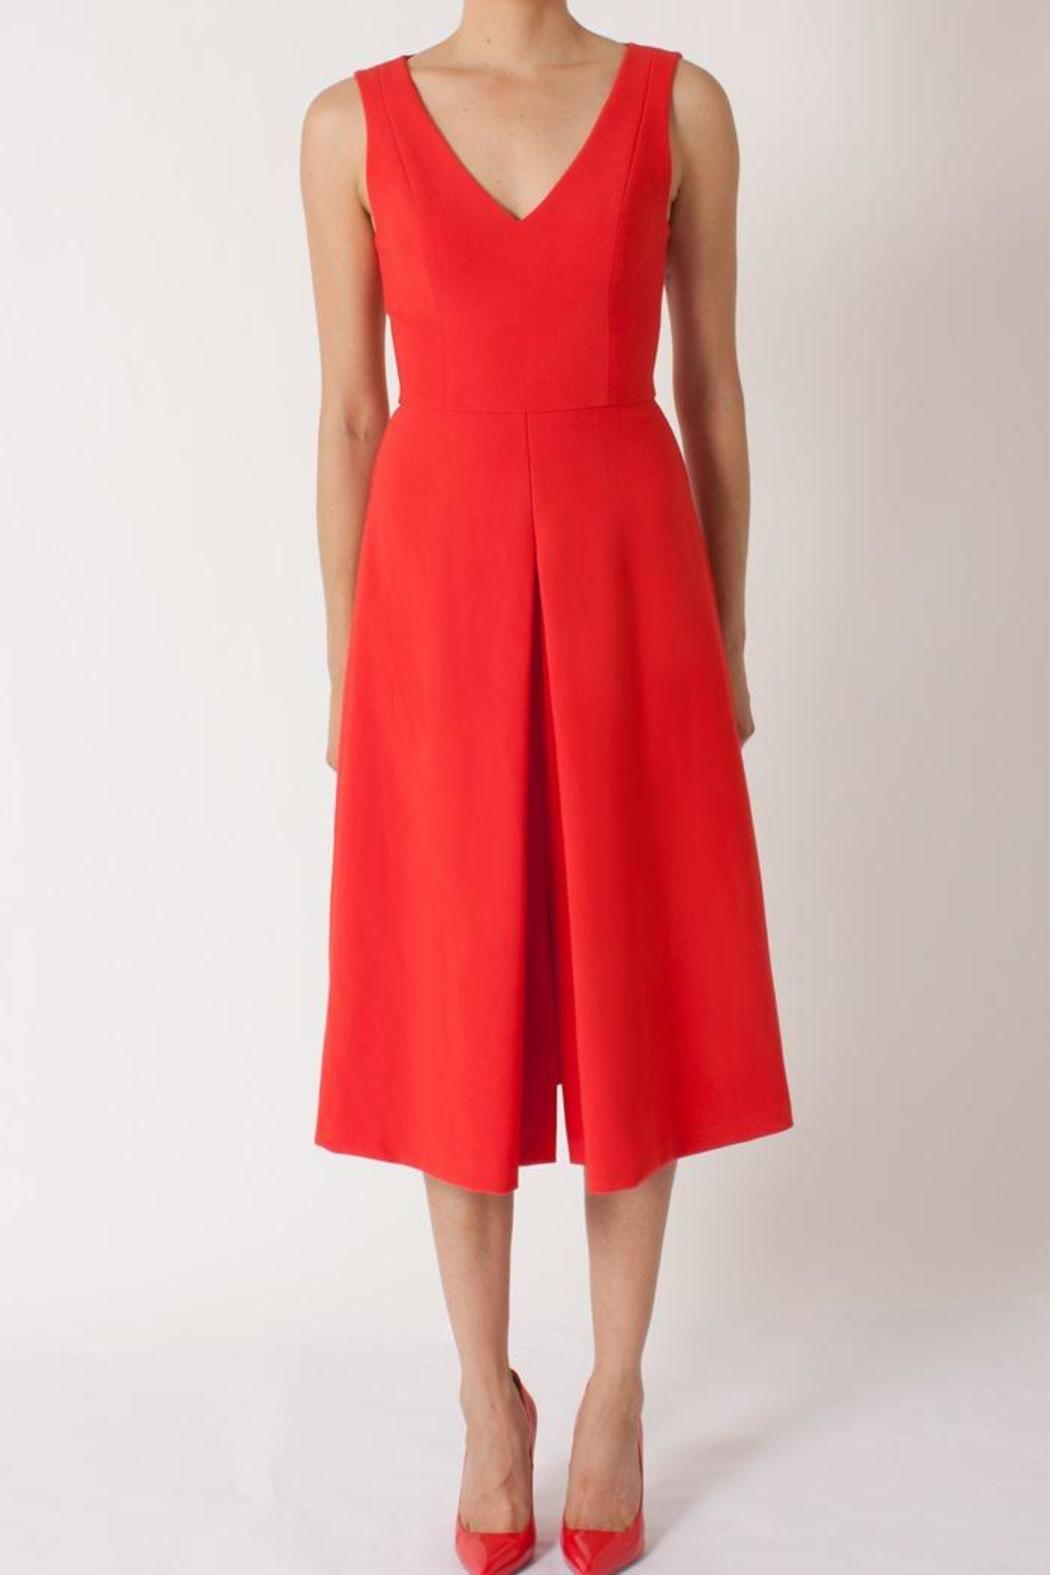 Black halo klara red dress bays halo and products